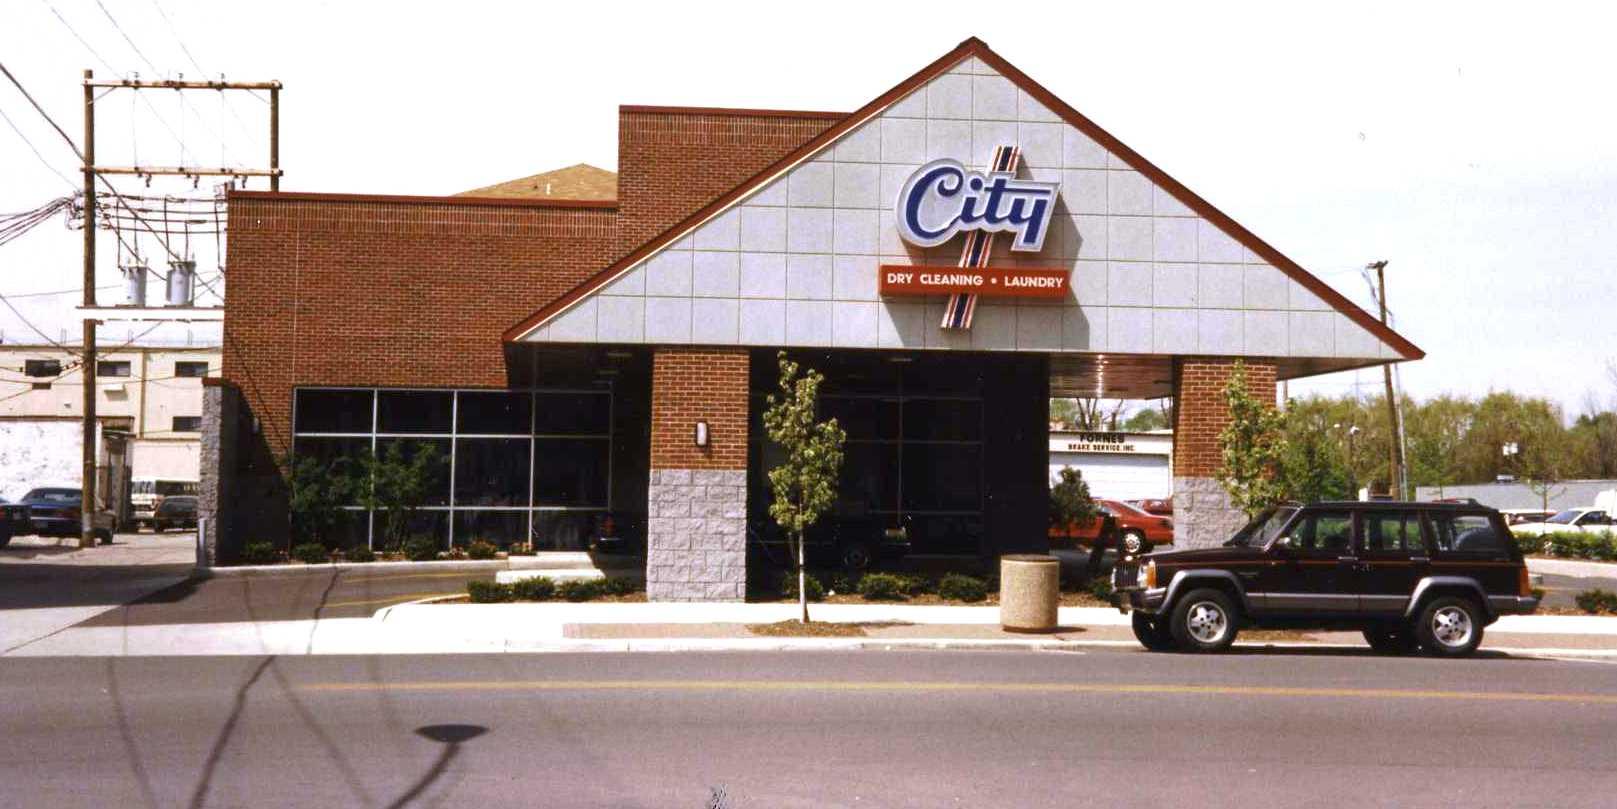 1995 City Laundry.jpg